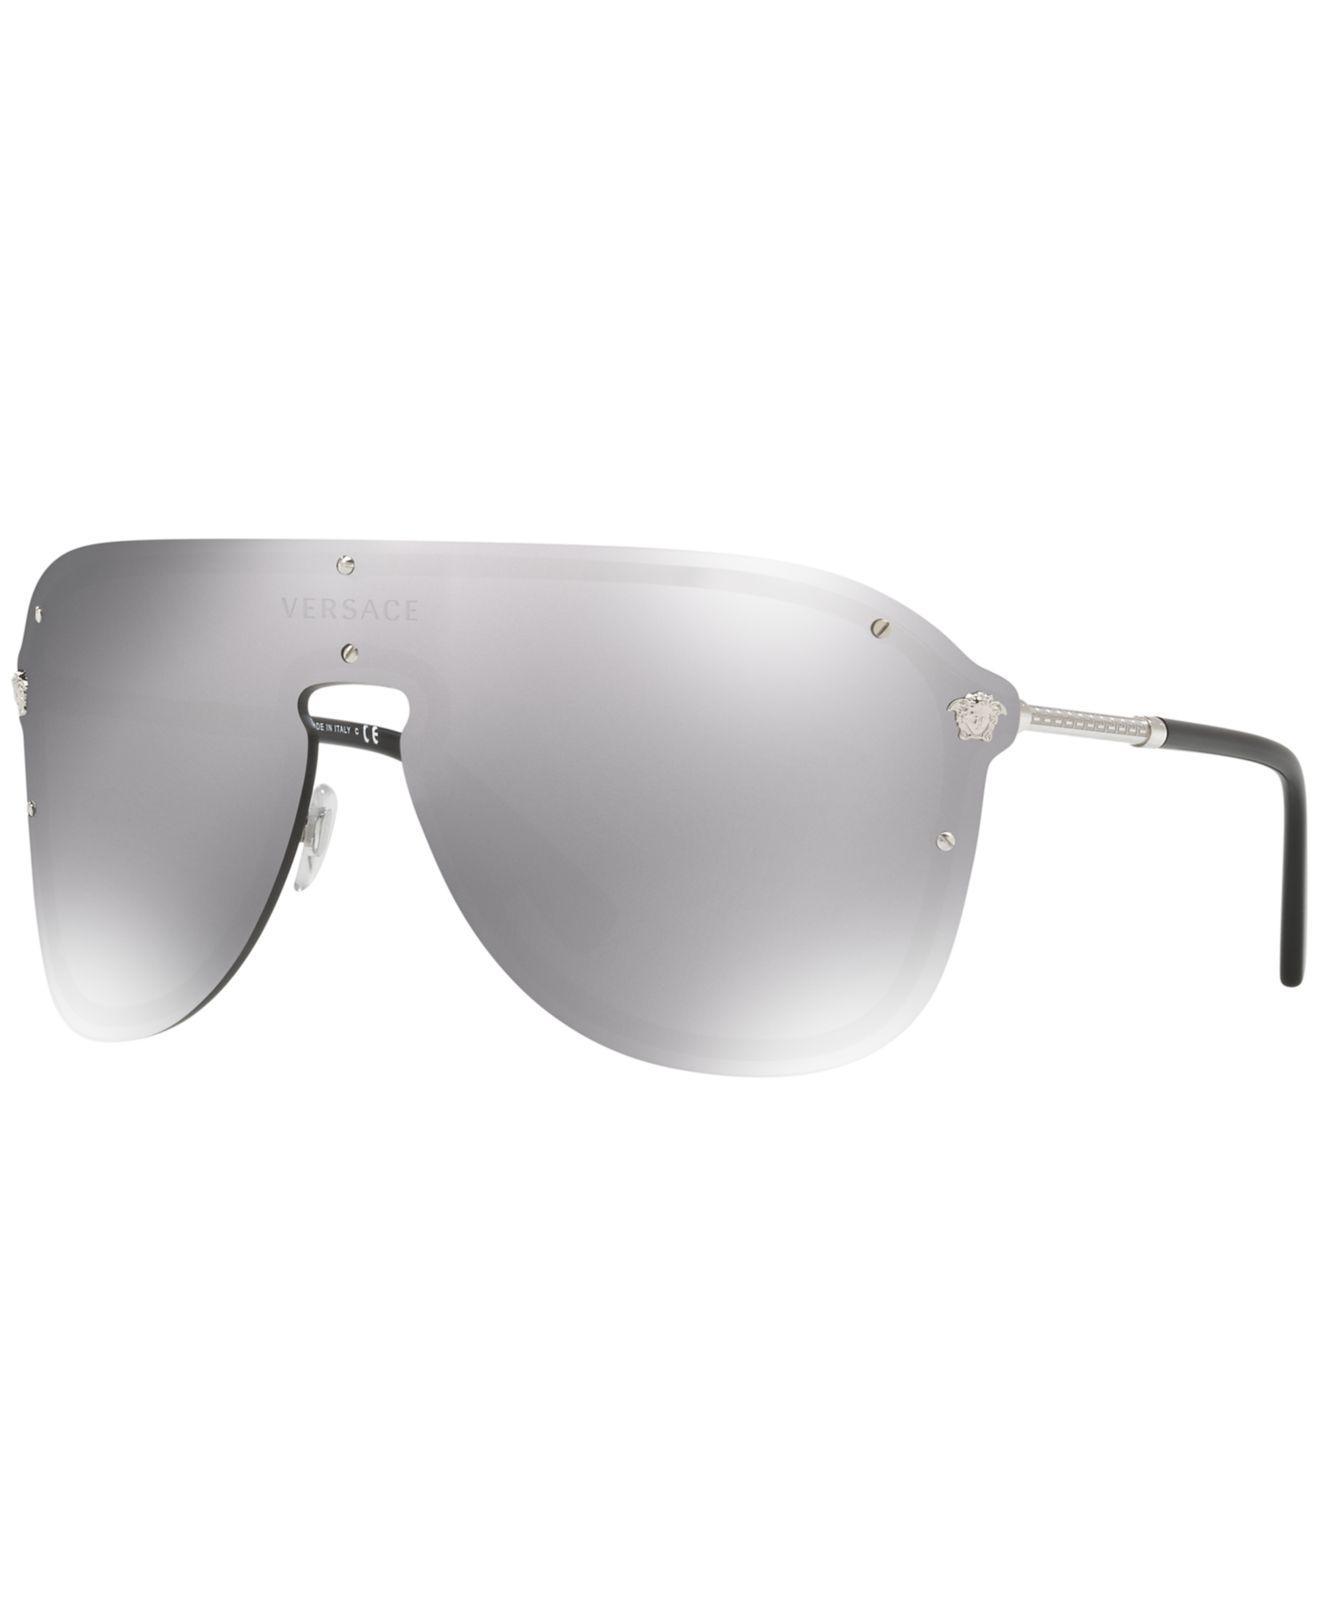 dab24a3271 Versace. Women s Gray Sunglasses ...